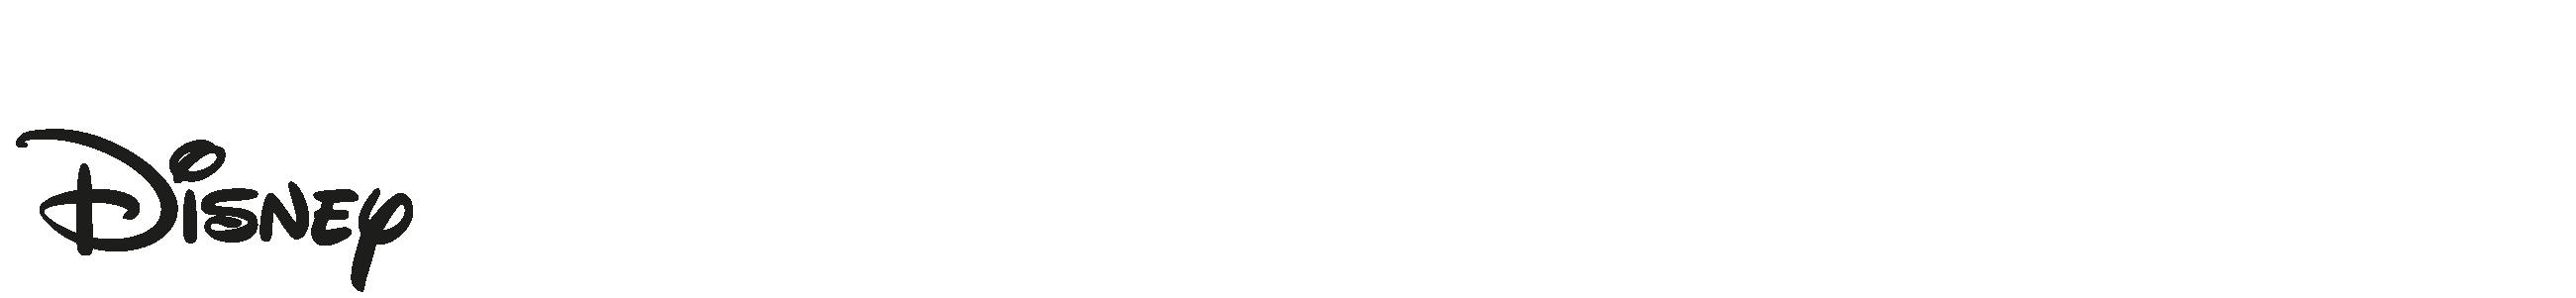 MADHOUSE – WEB_V3_VAMPIRINA – CLIENTES